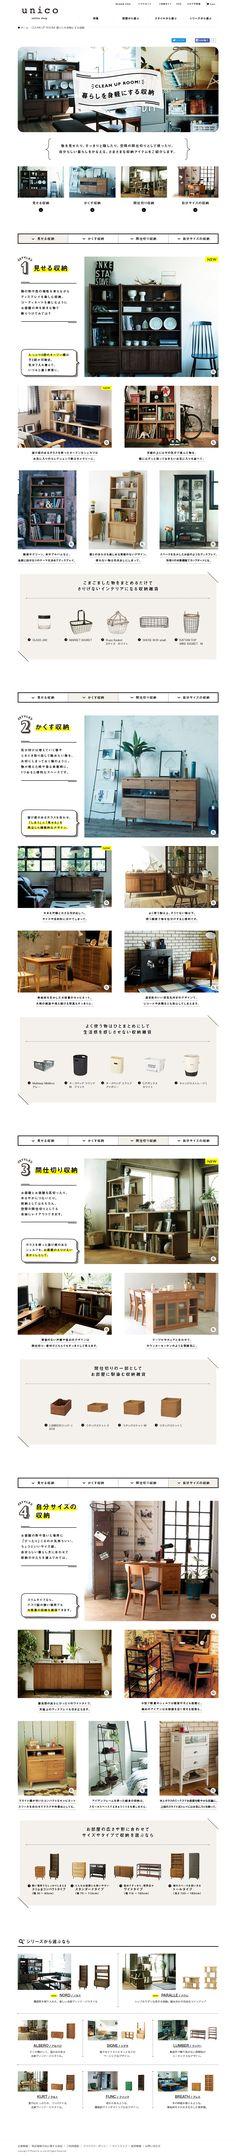 http://www.unico-fan.co.jp/feature/living_storage/index.html?s=f151127